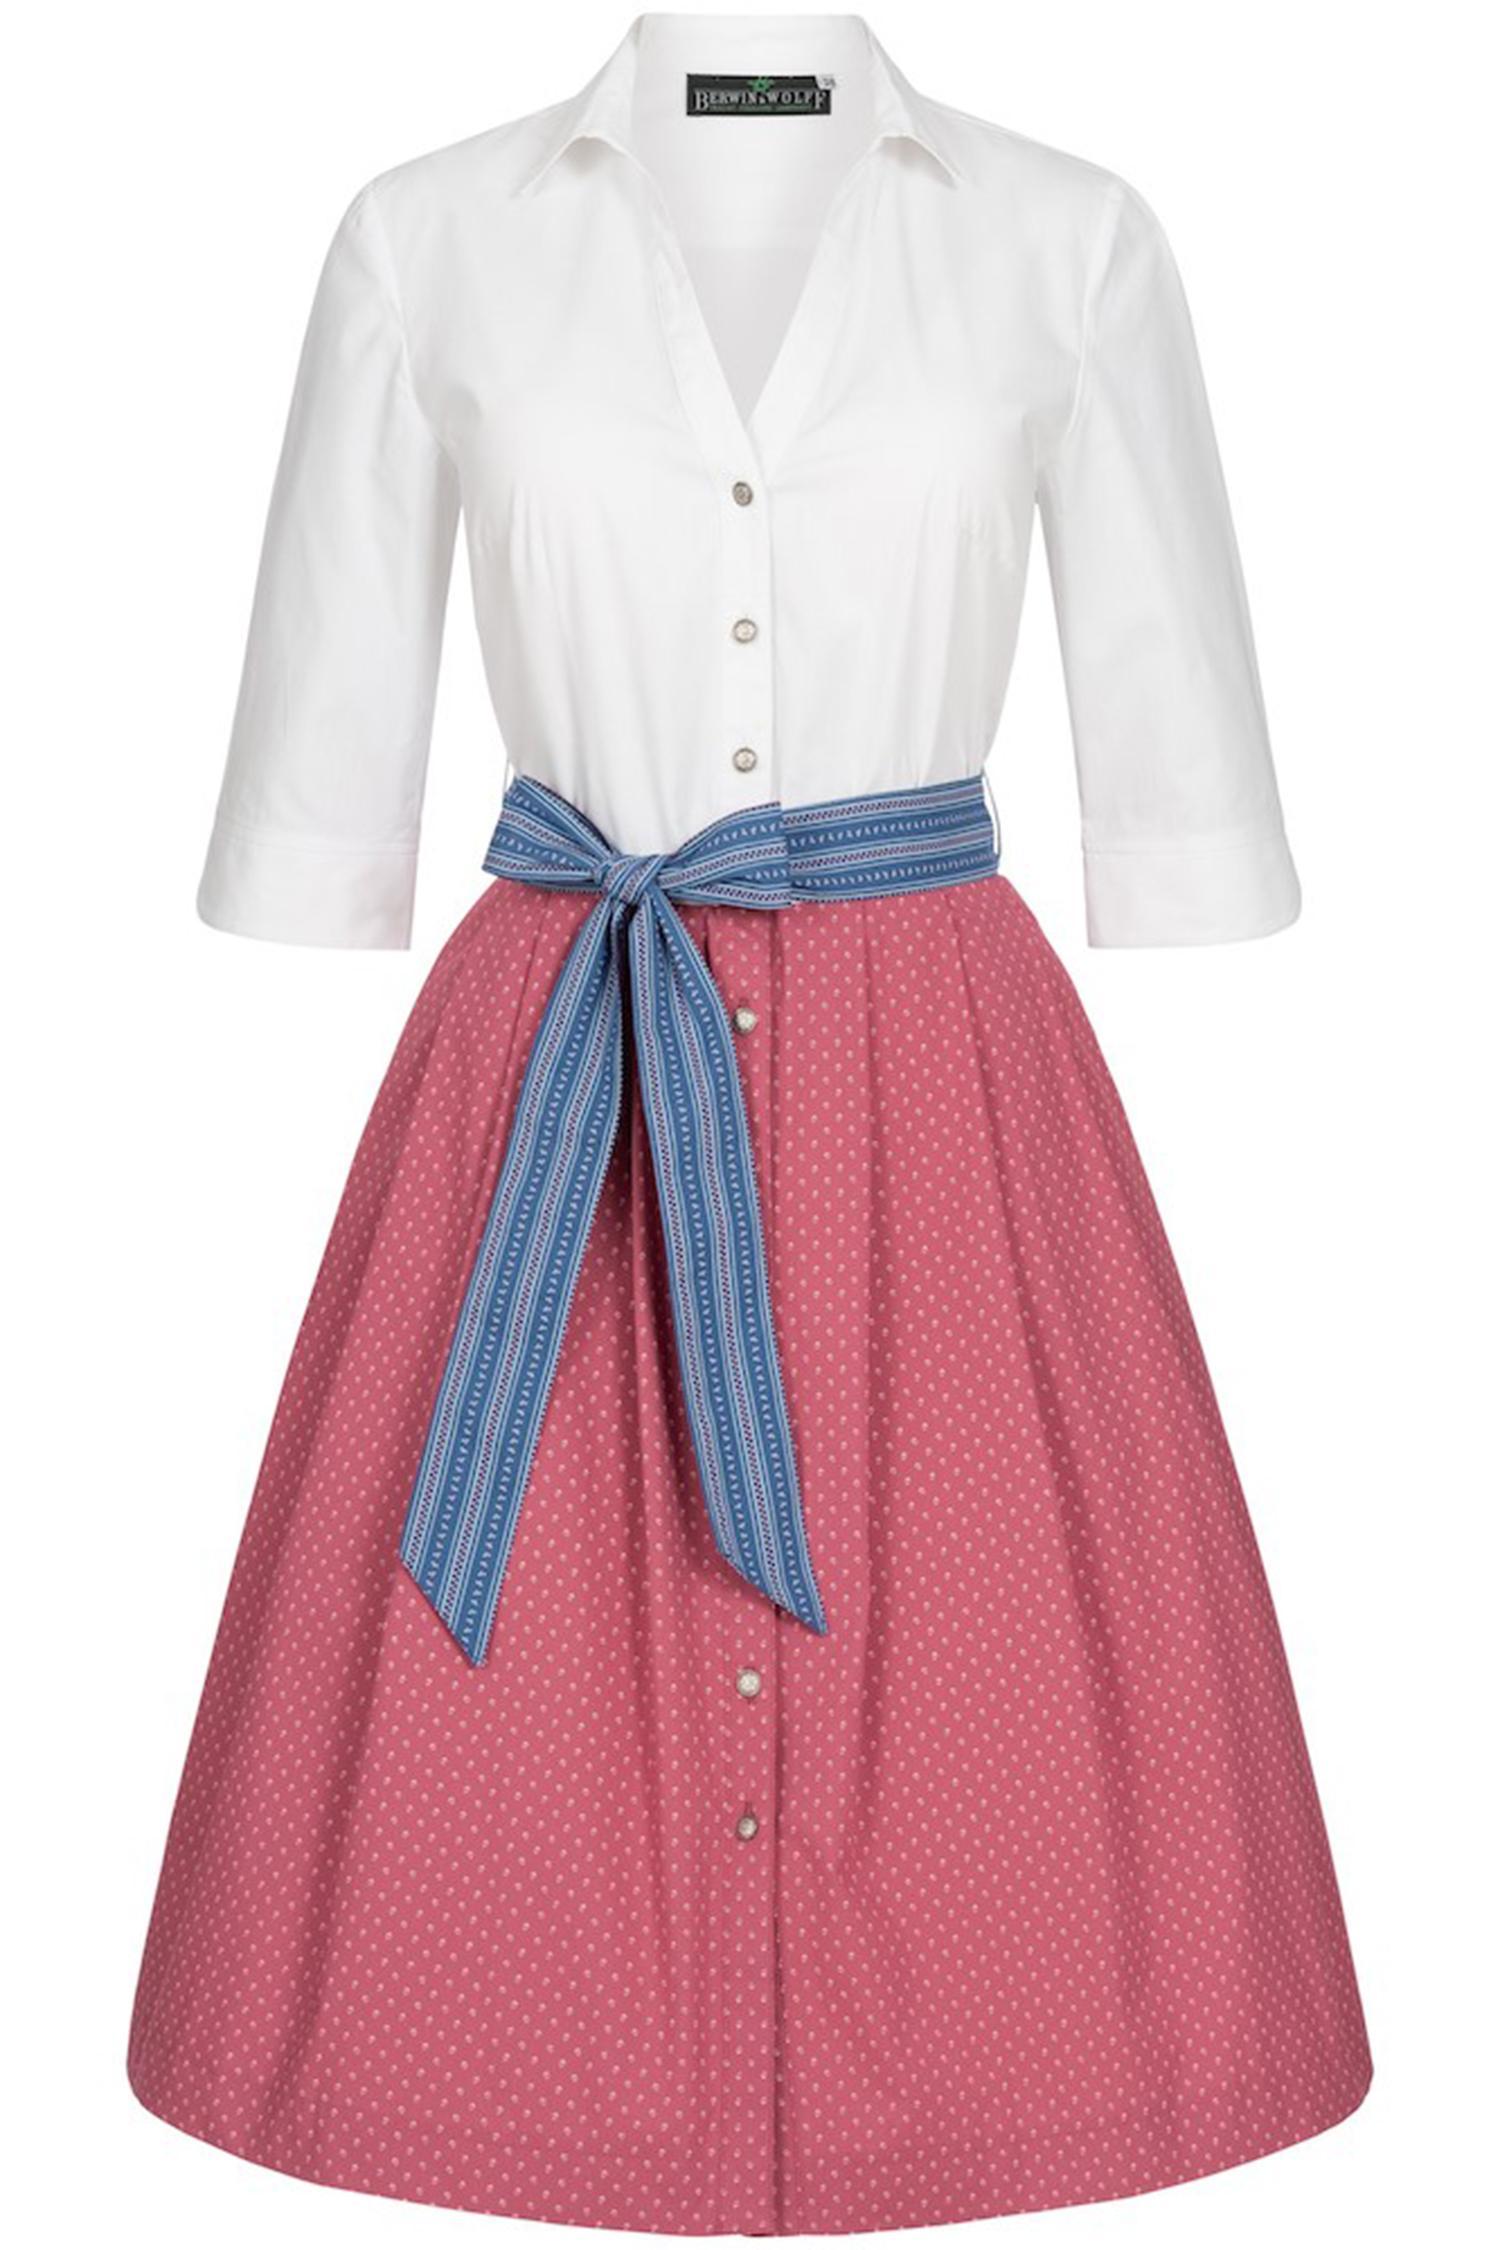 Hemdblusenkleid 34 | weiß / beere / blau